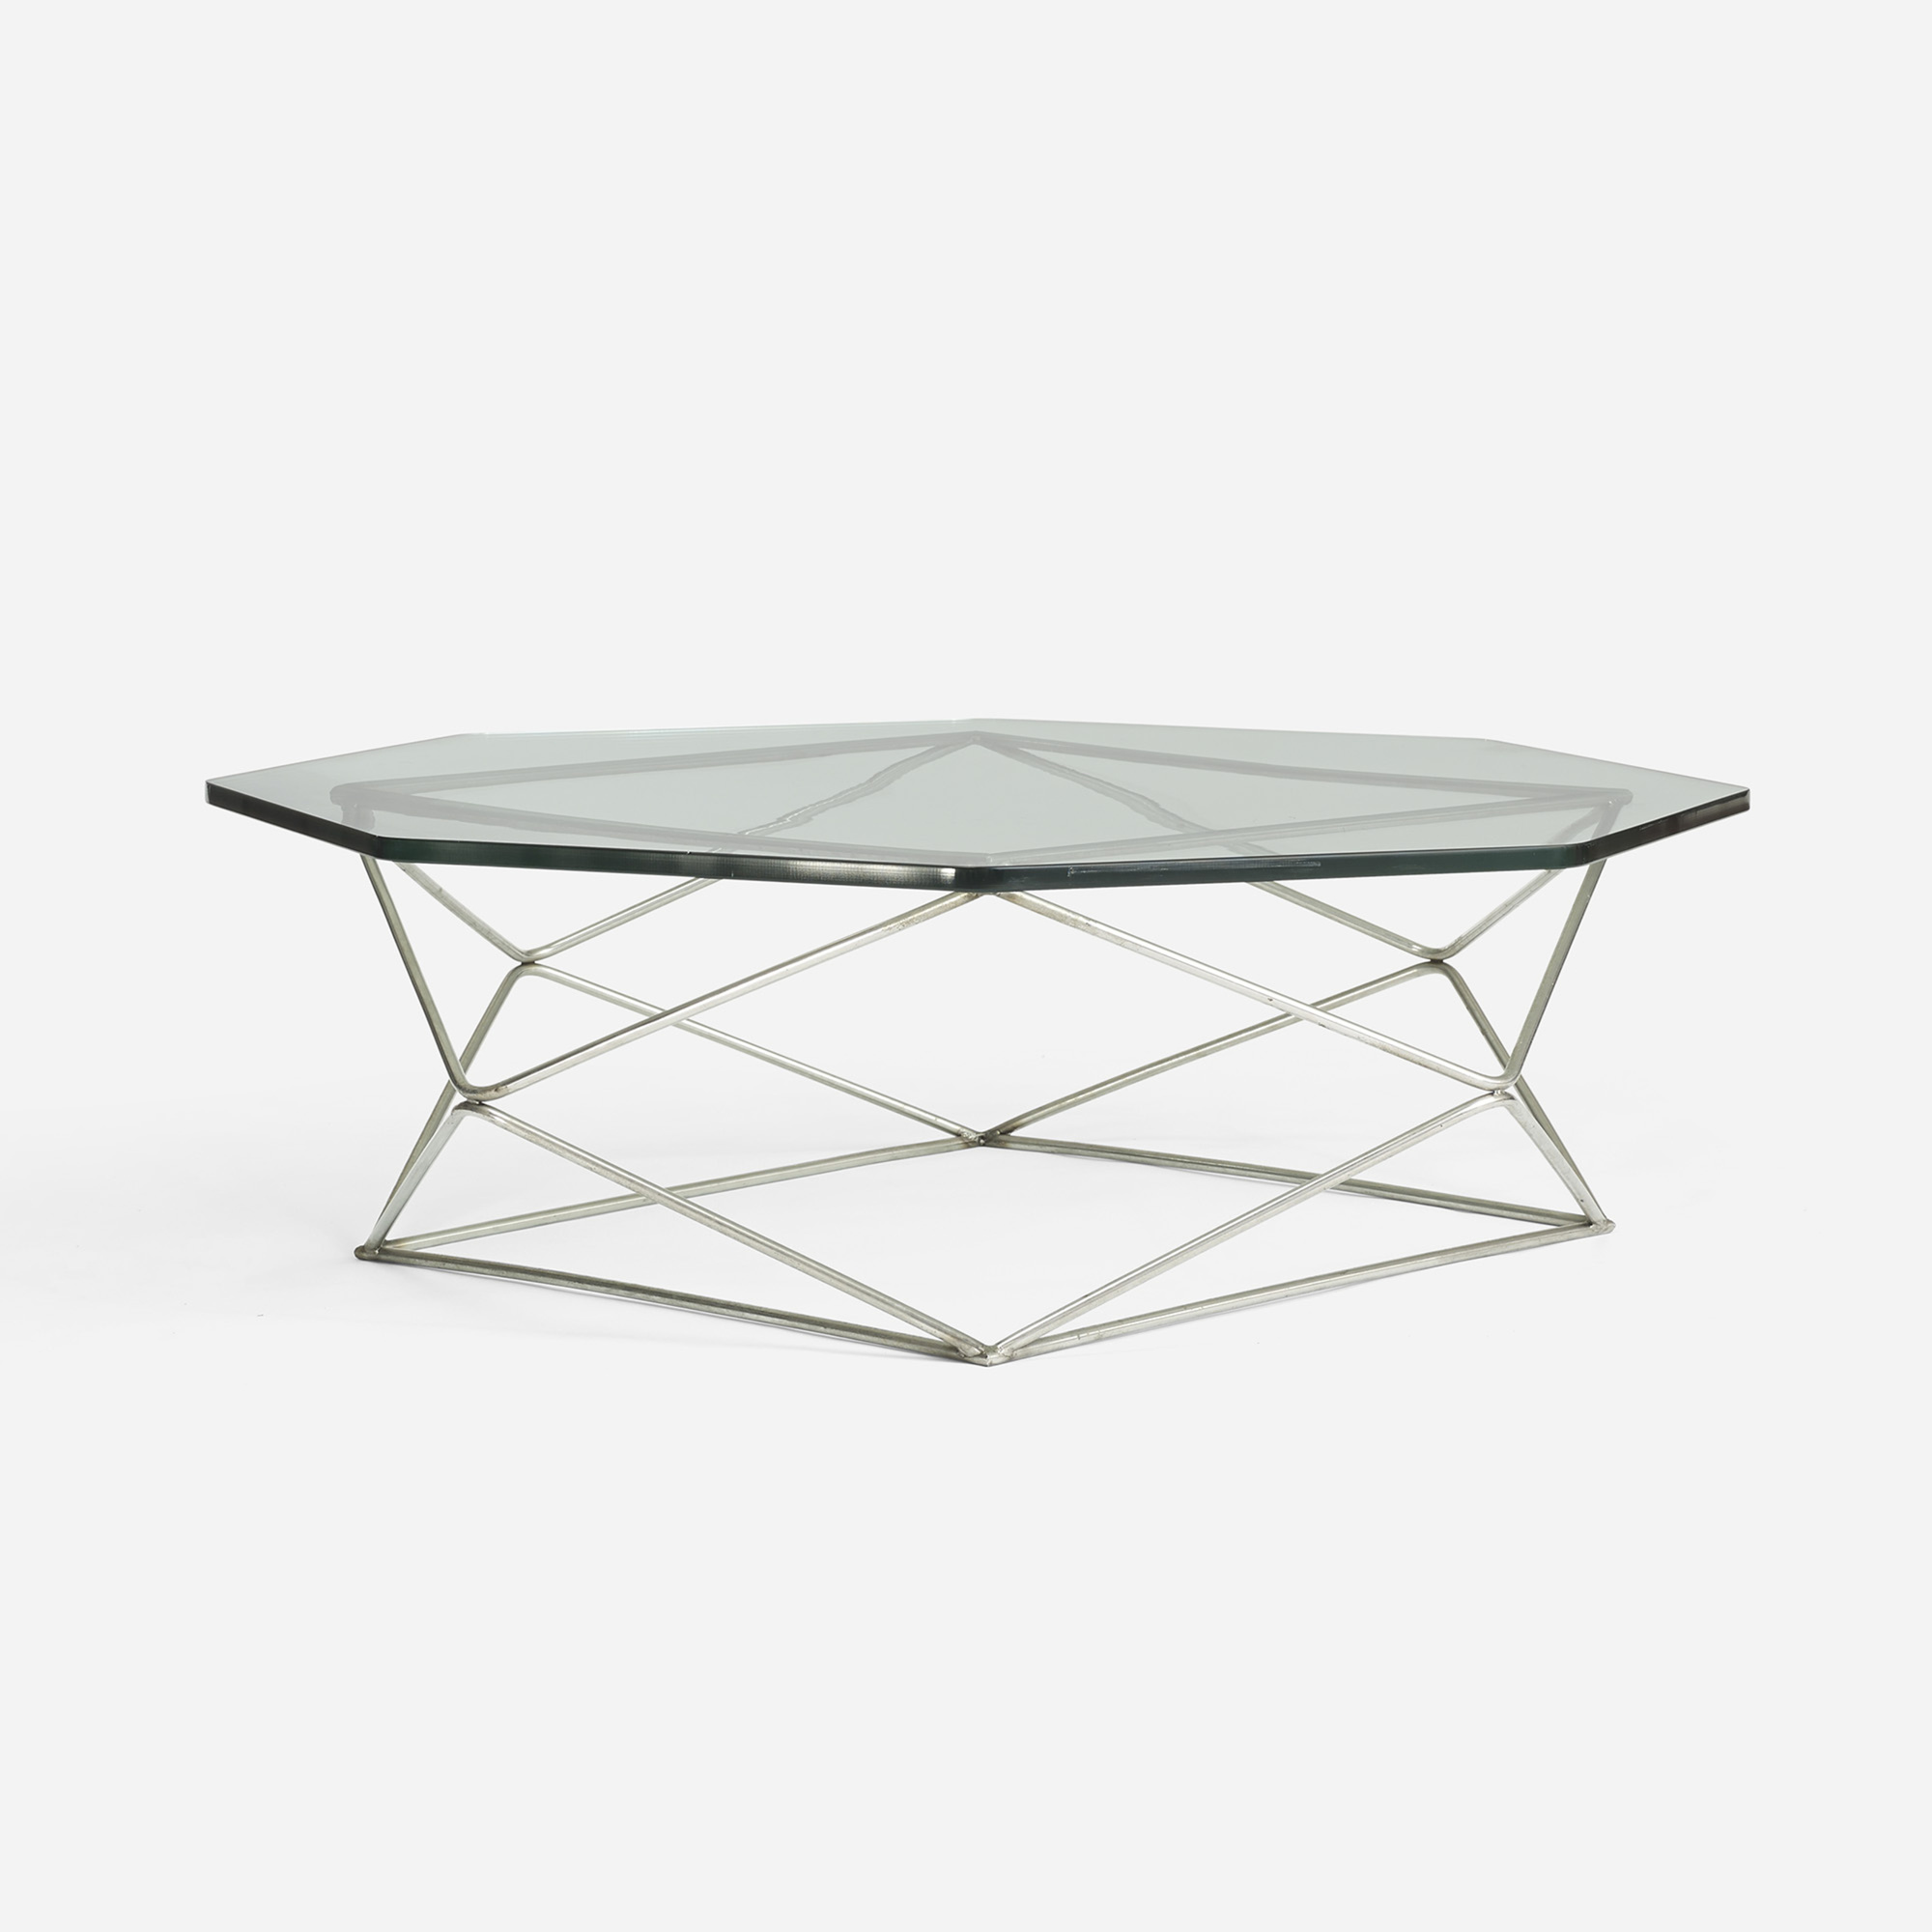 150: Milo Baughman / coffee table (1 of 3)